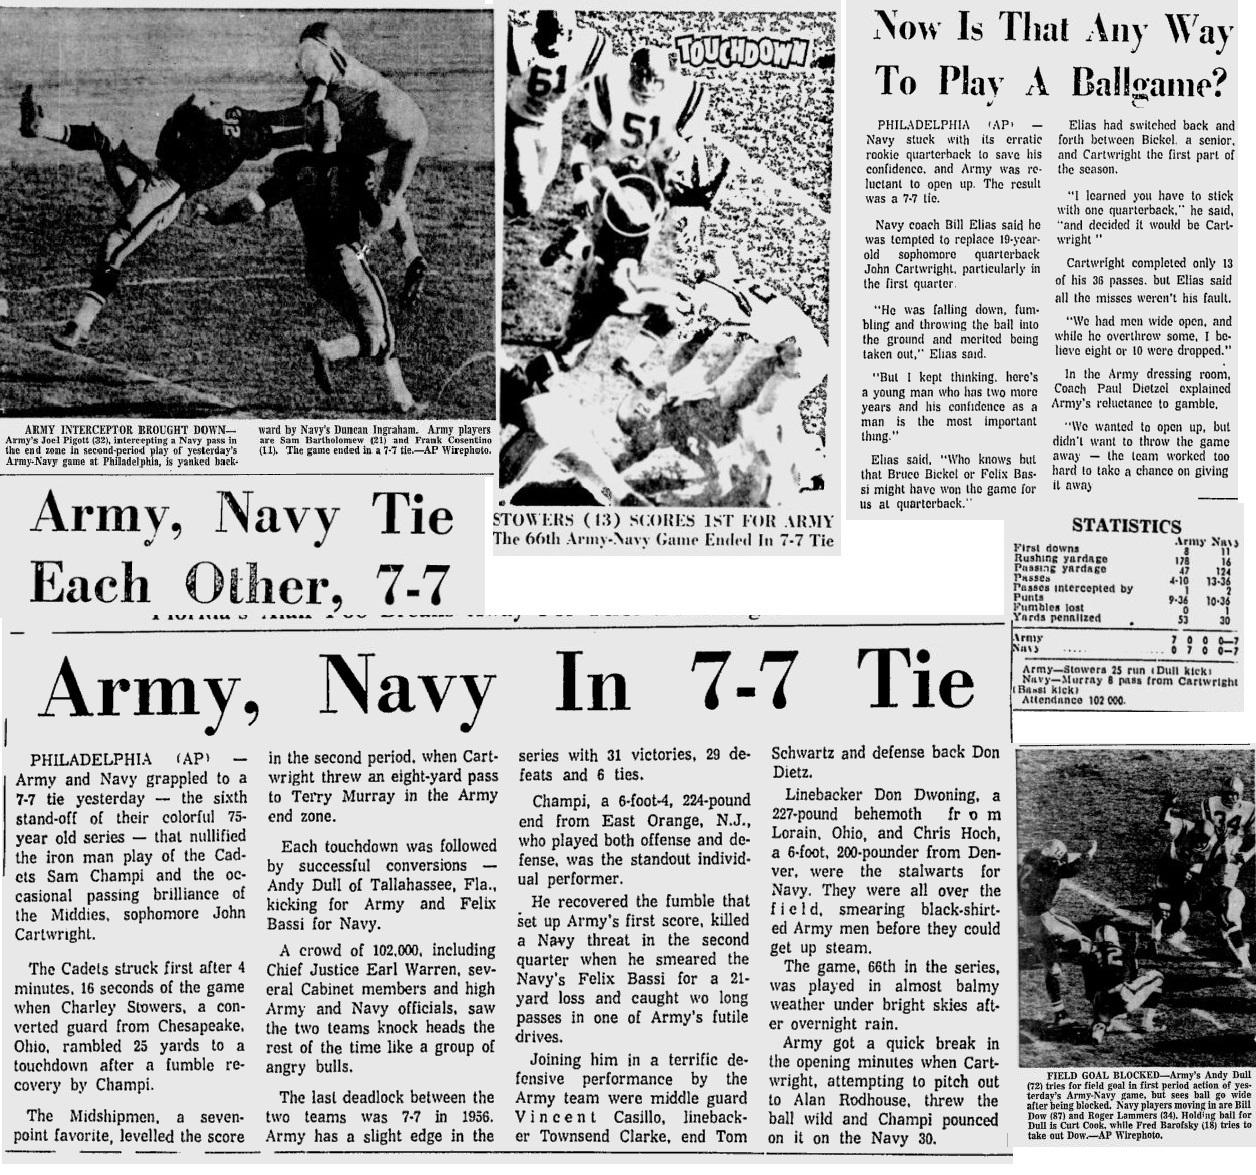 armyfb_1965_vsnavy_themiaminews_nov281965